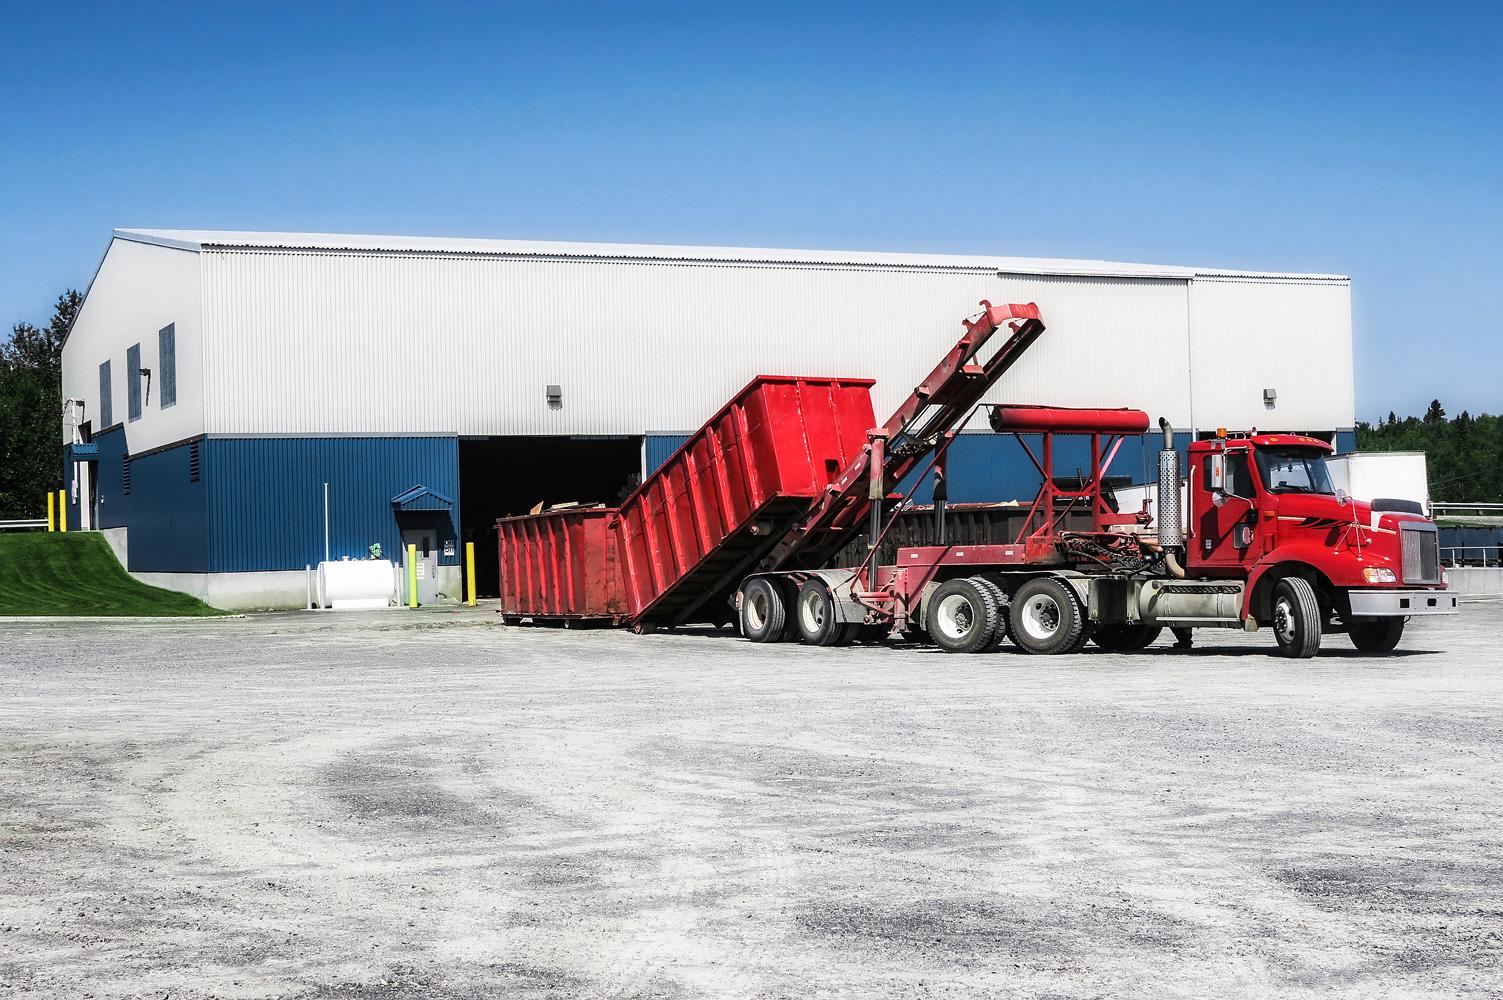 truck off-loading dumpster